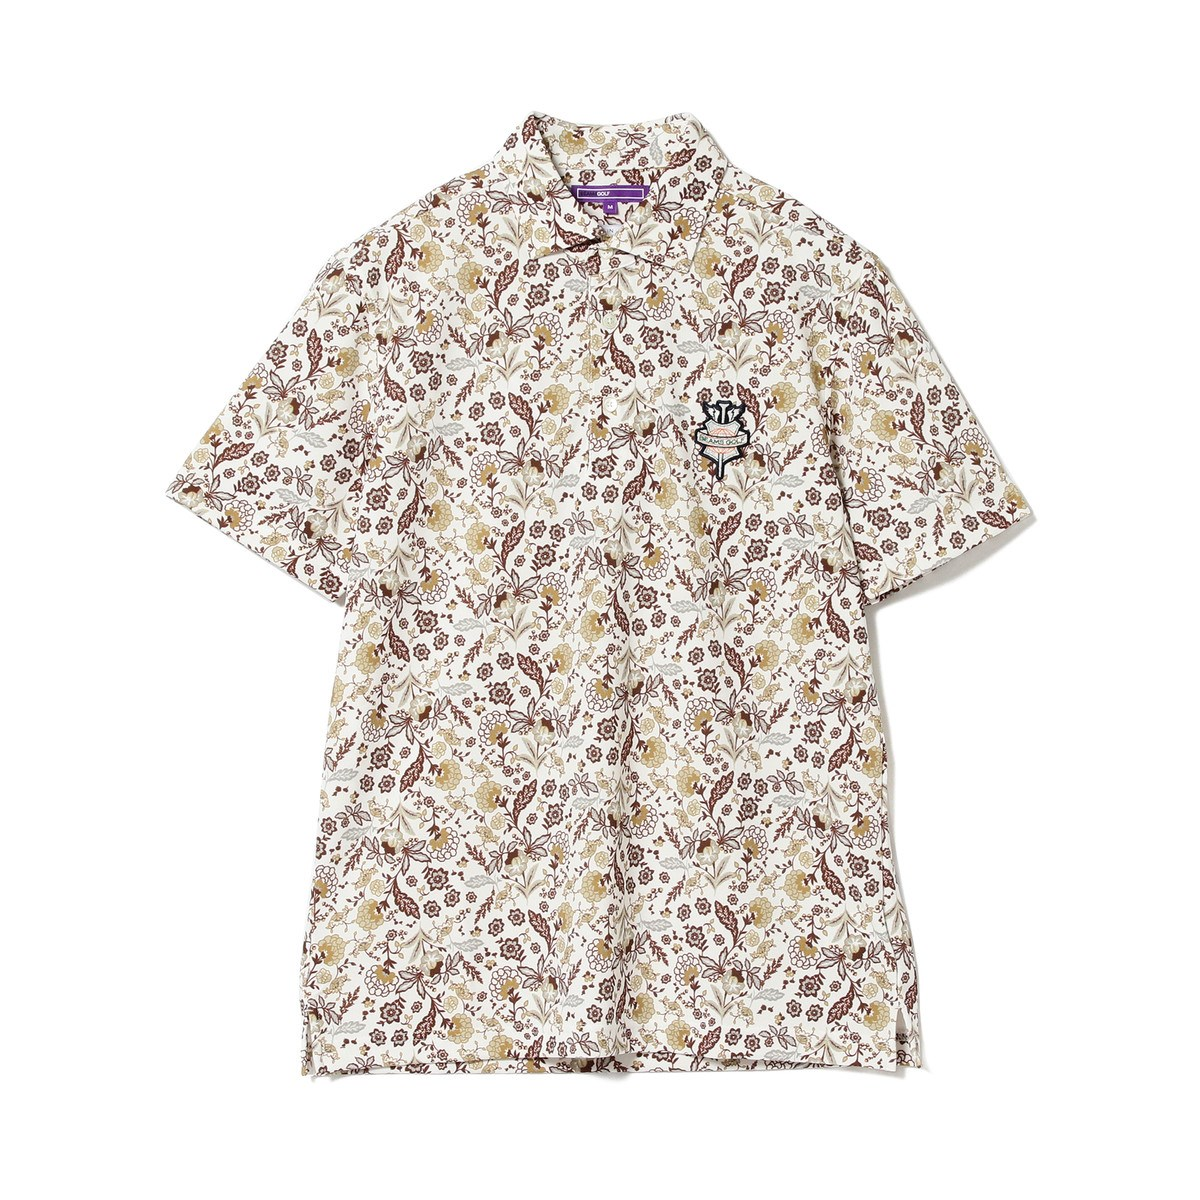 BEAMS GOLF PURPLE LABEL MIX フラワー リゾート ポロシャツ